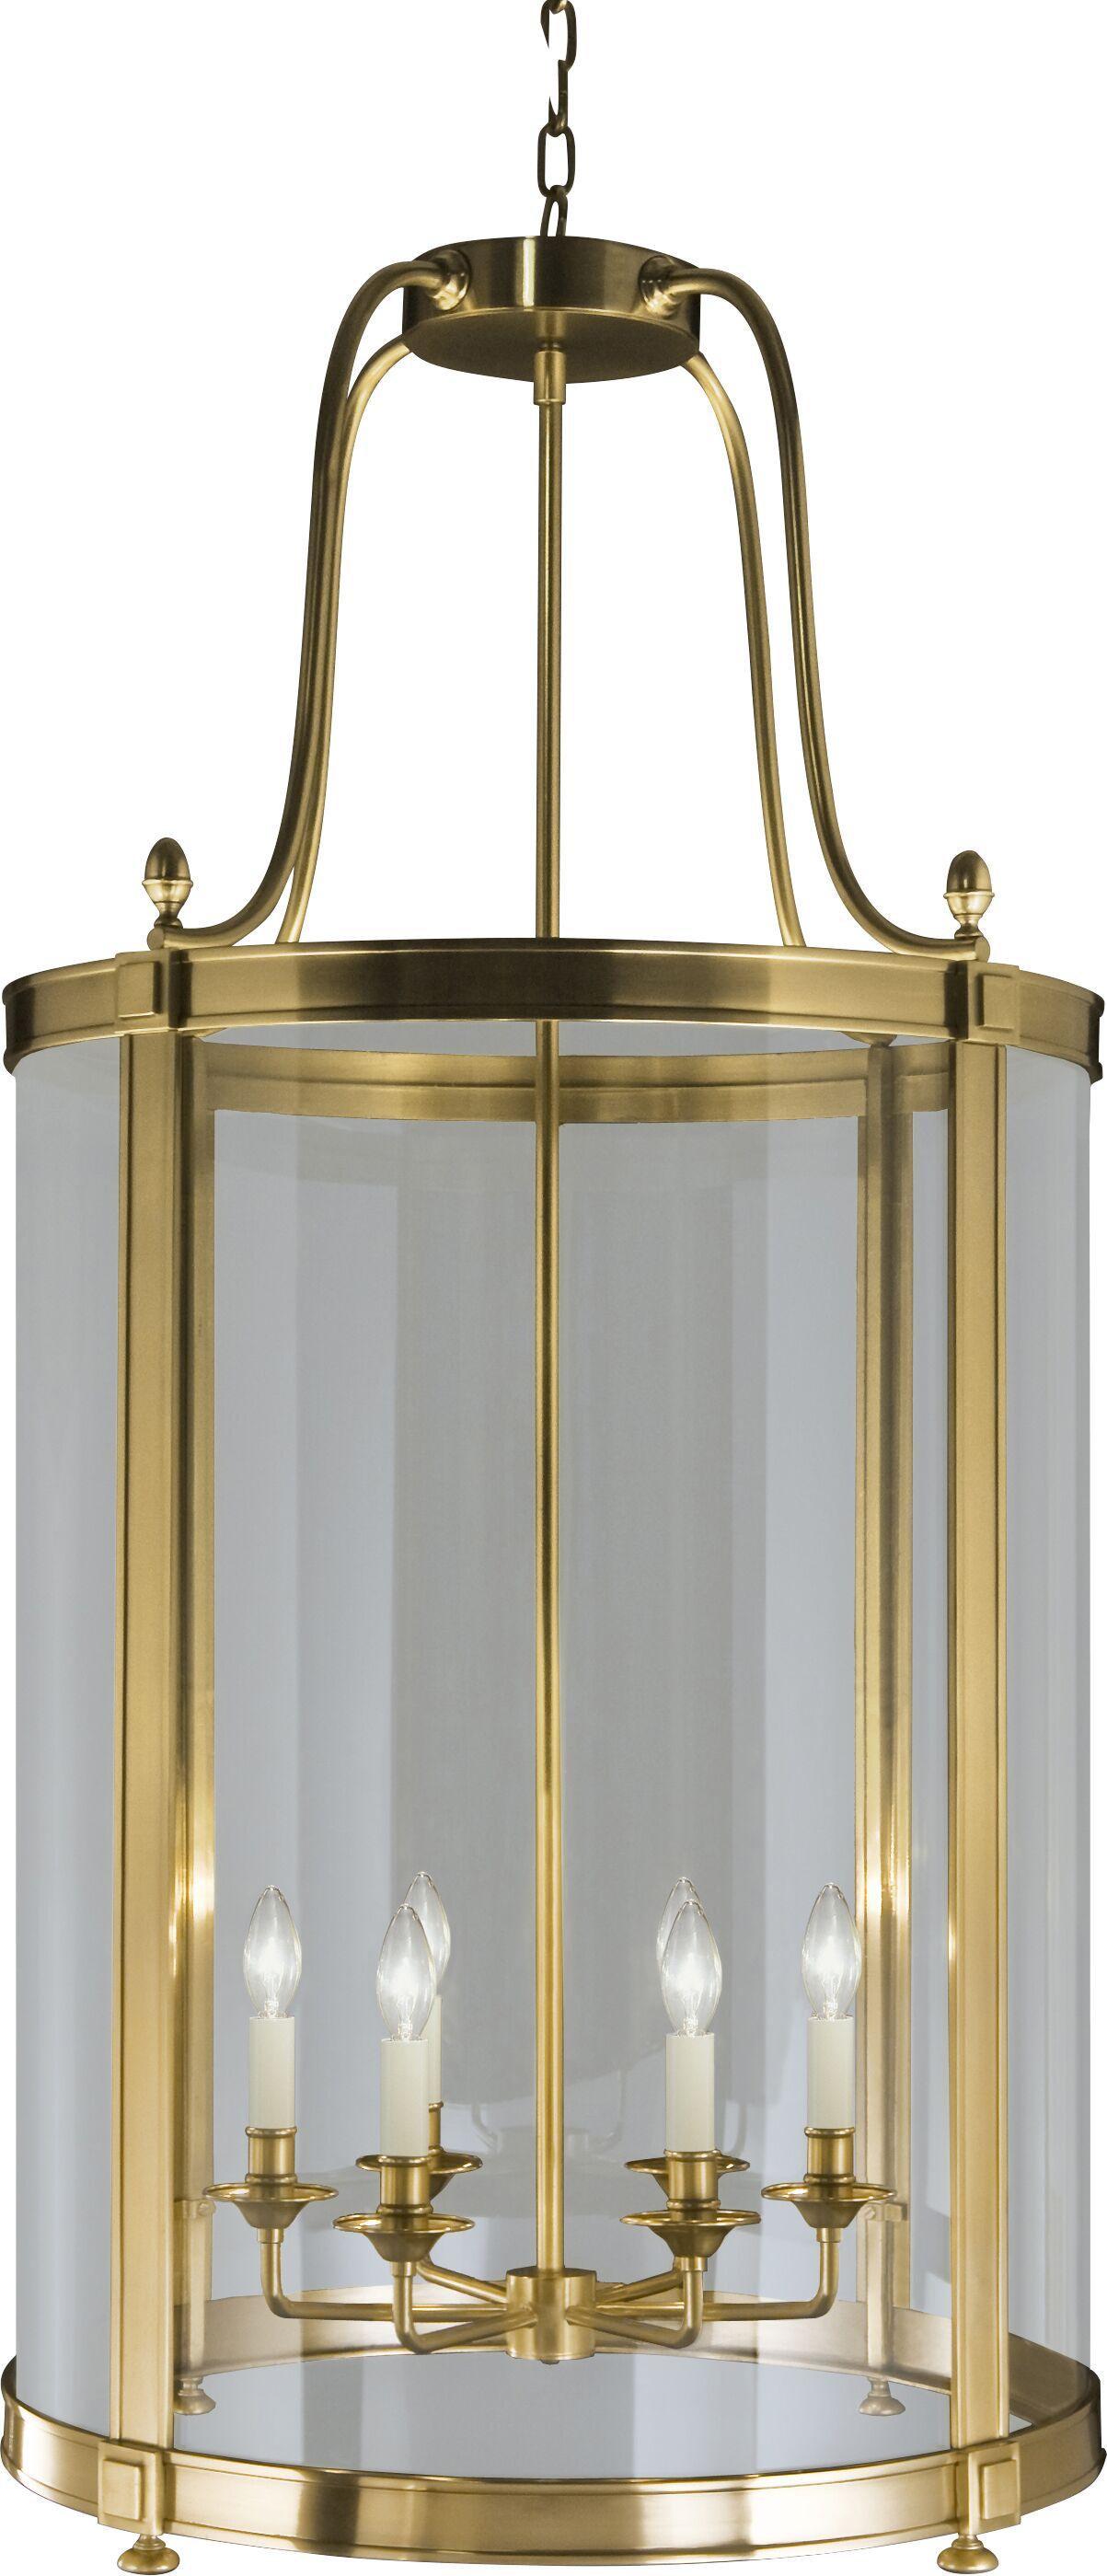 Blake 6-Light Pendant Finish: Antique Brass